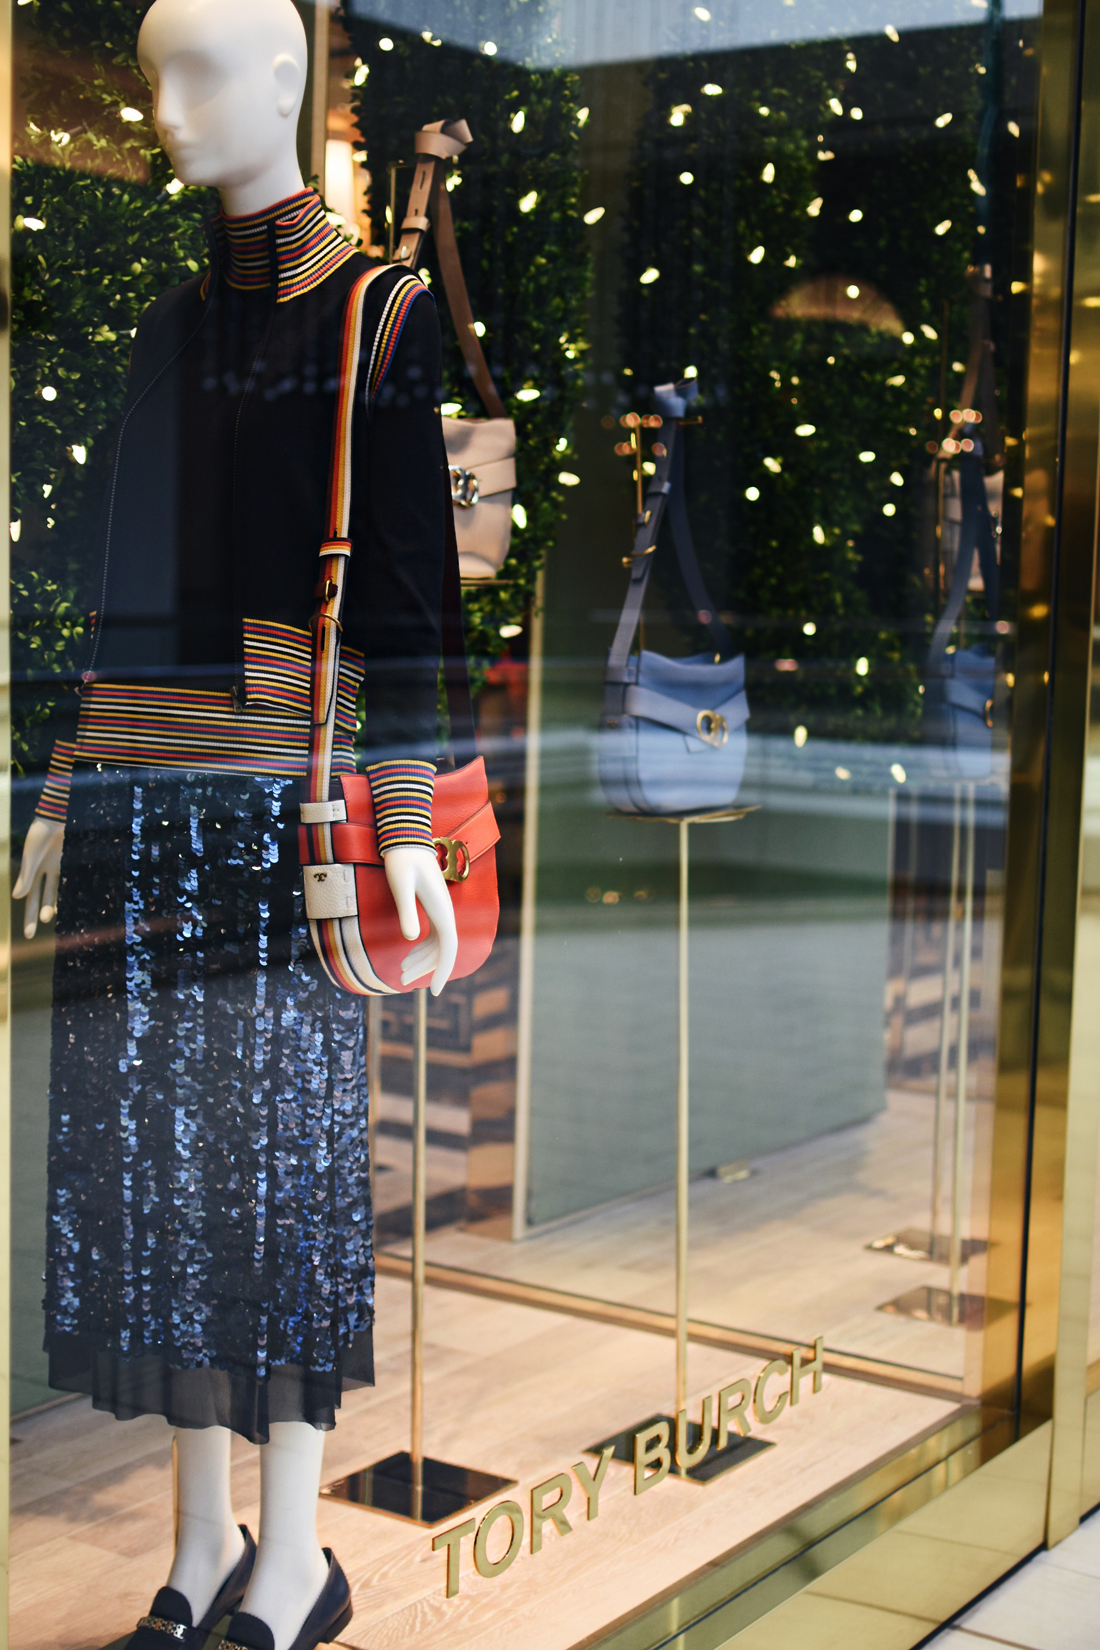 Tory Burch window display at Cherry Creek mall Denver